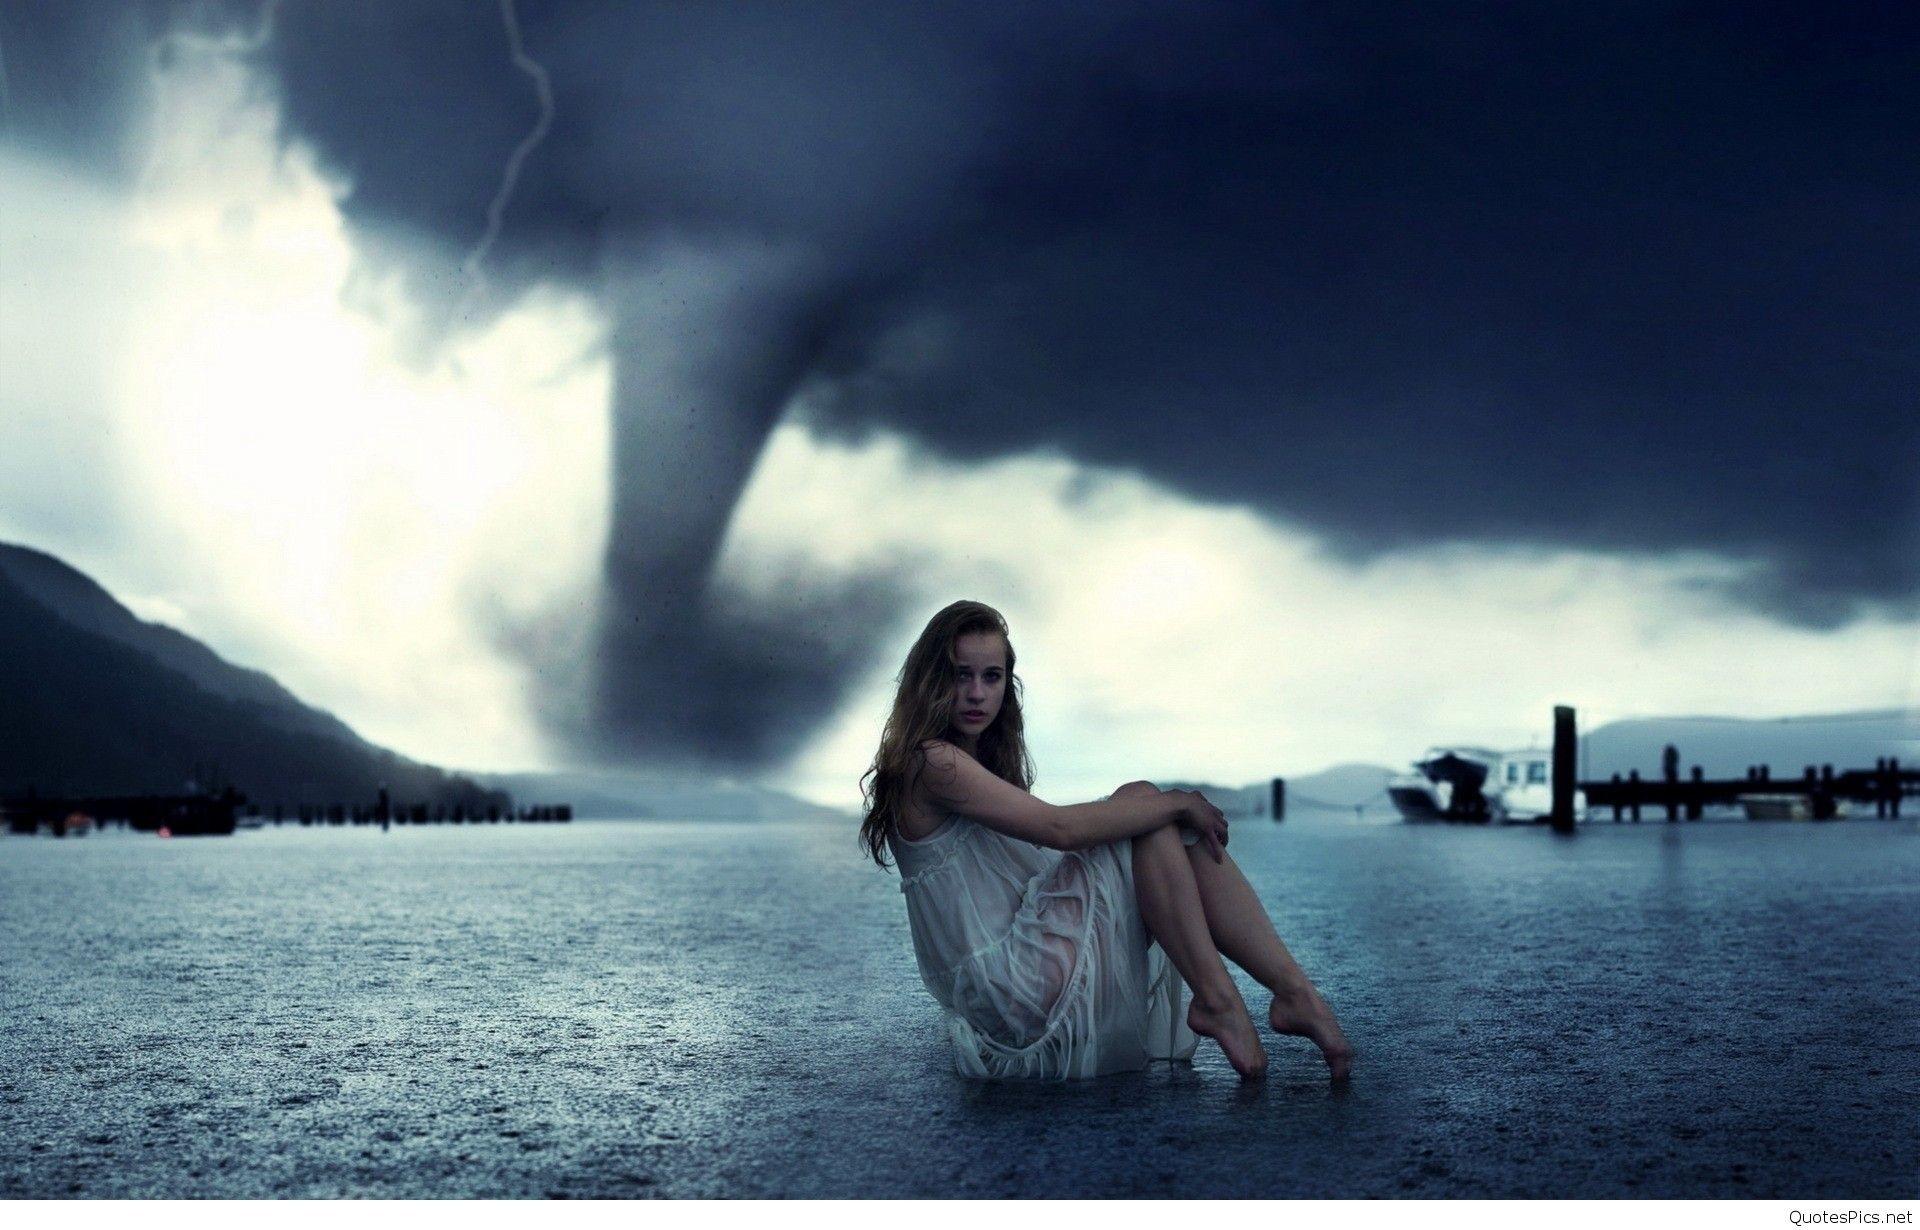 Alone-Girl-In-Tornado-Wallpaper